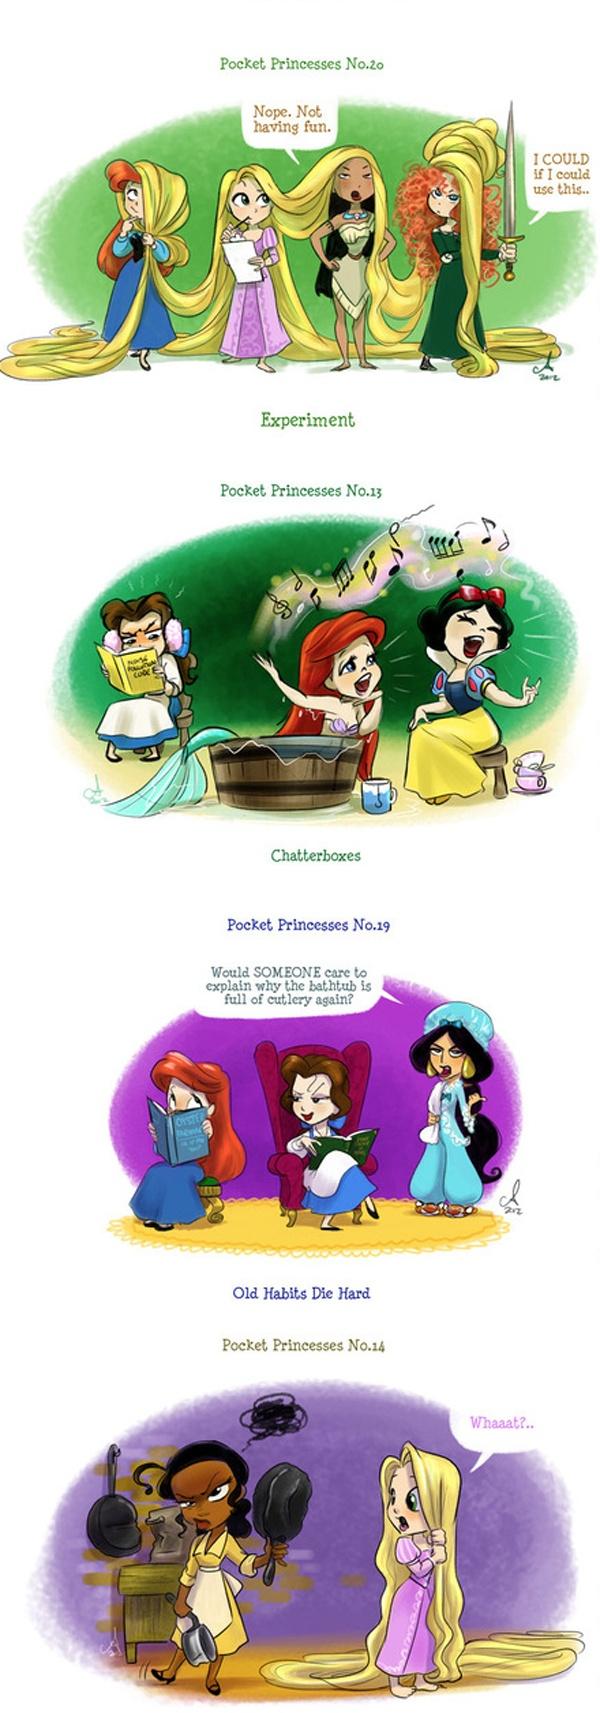 Pocket Princesses I think @Kaylan Mason would like the last one.